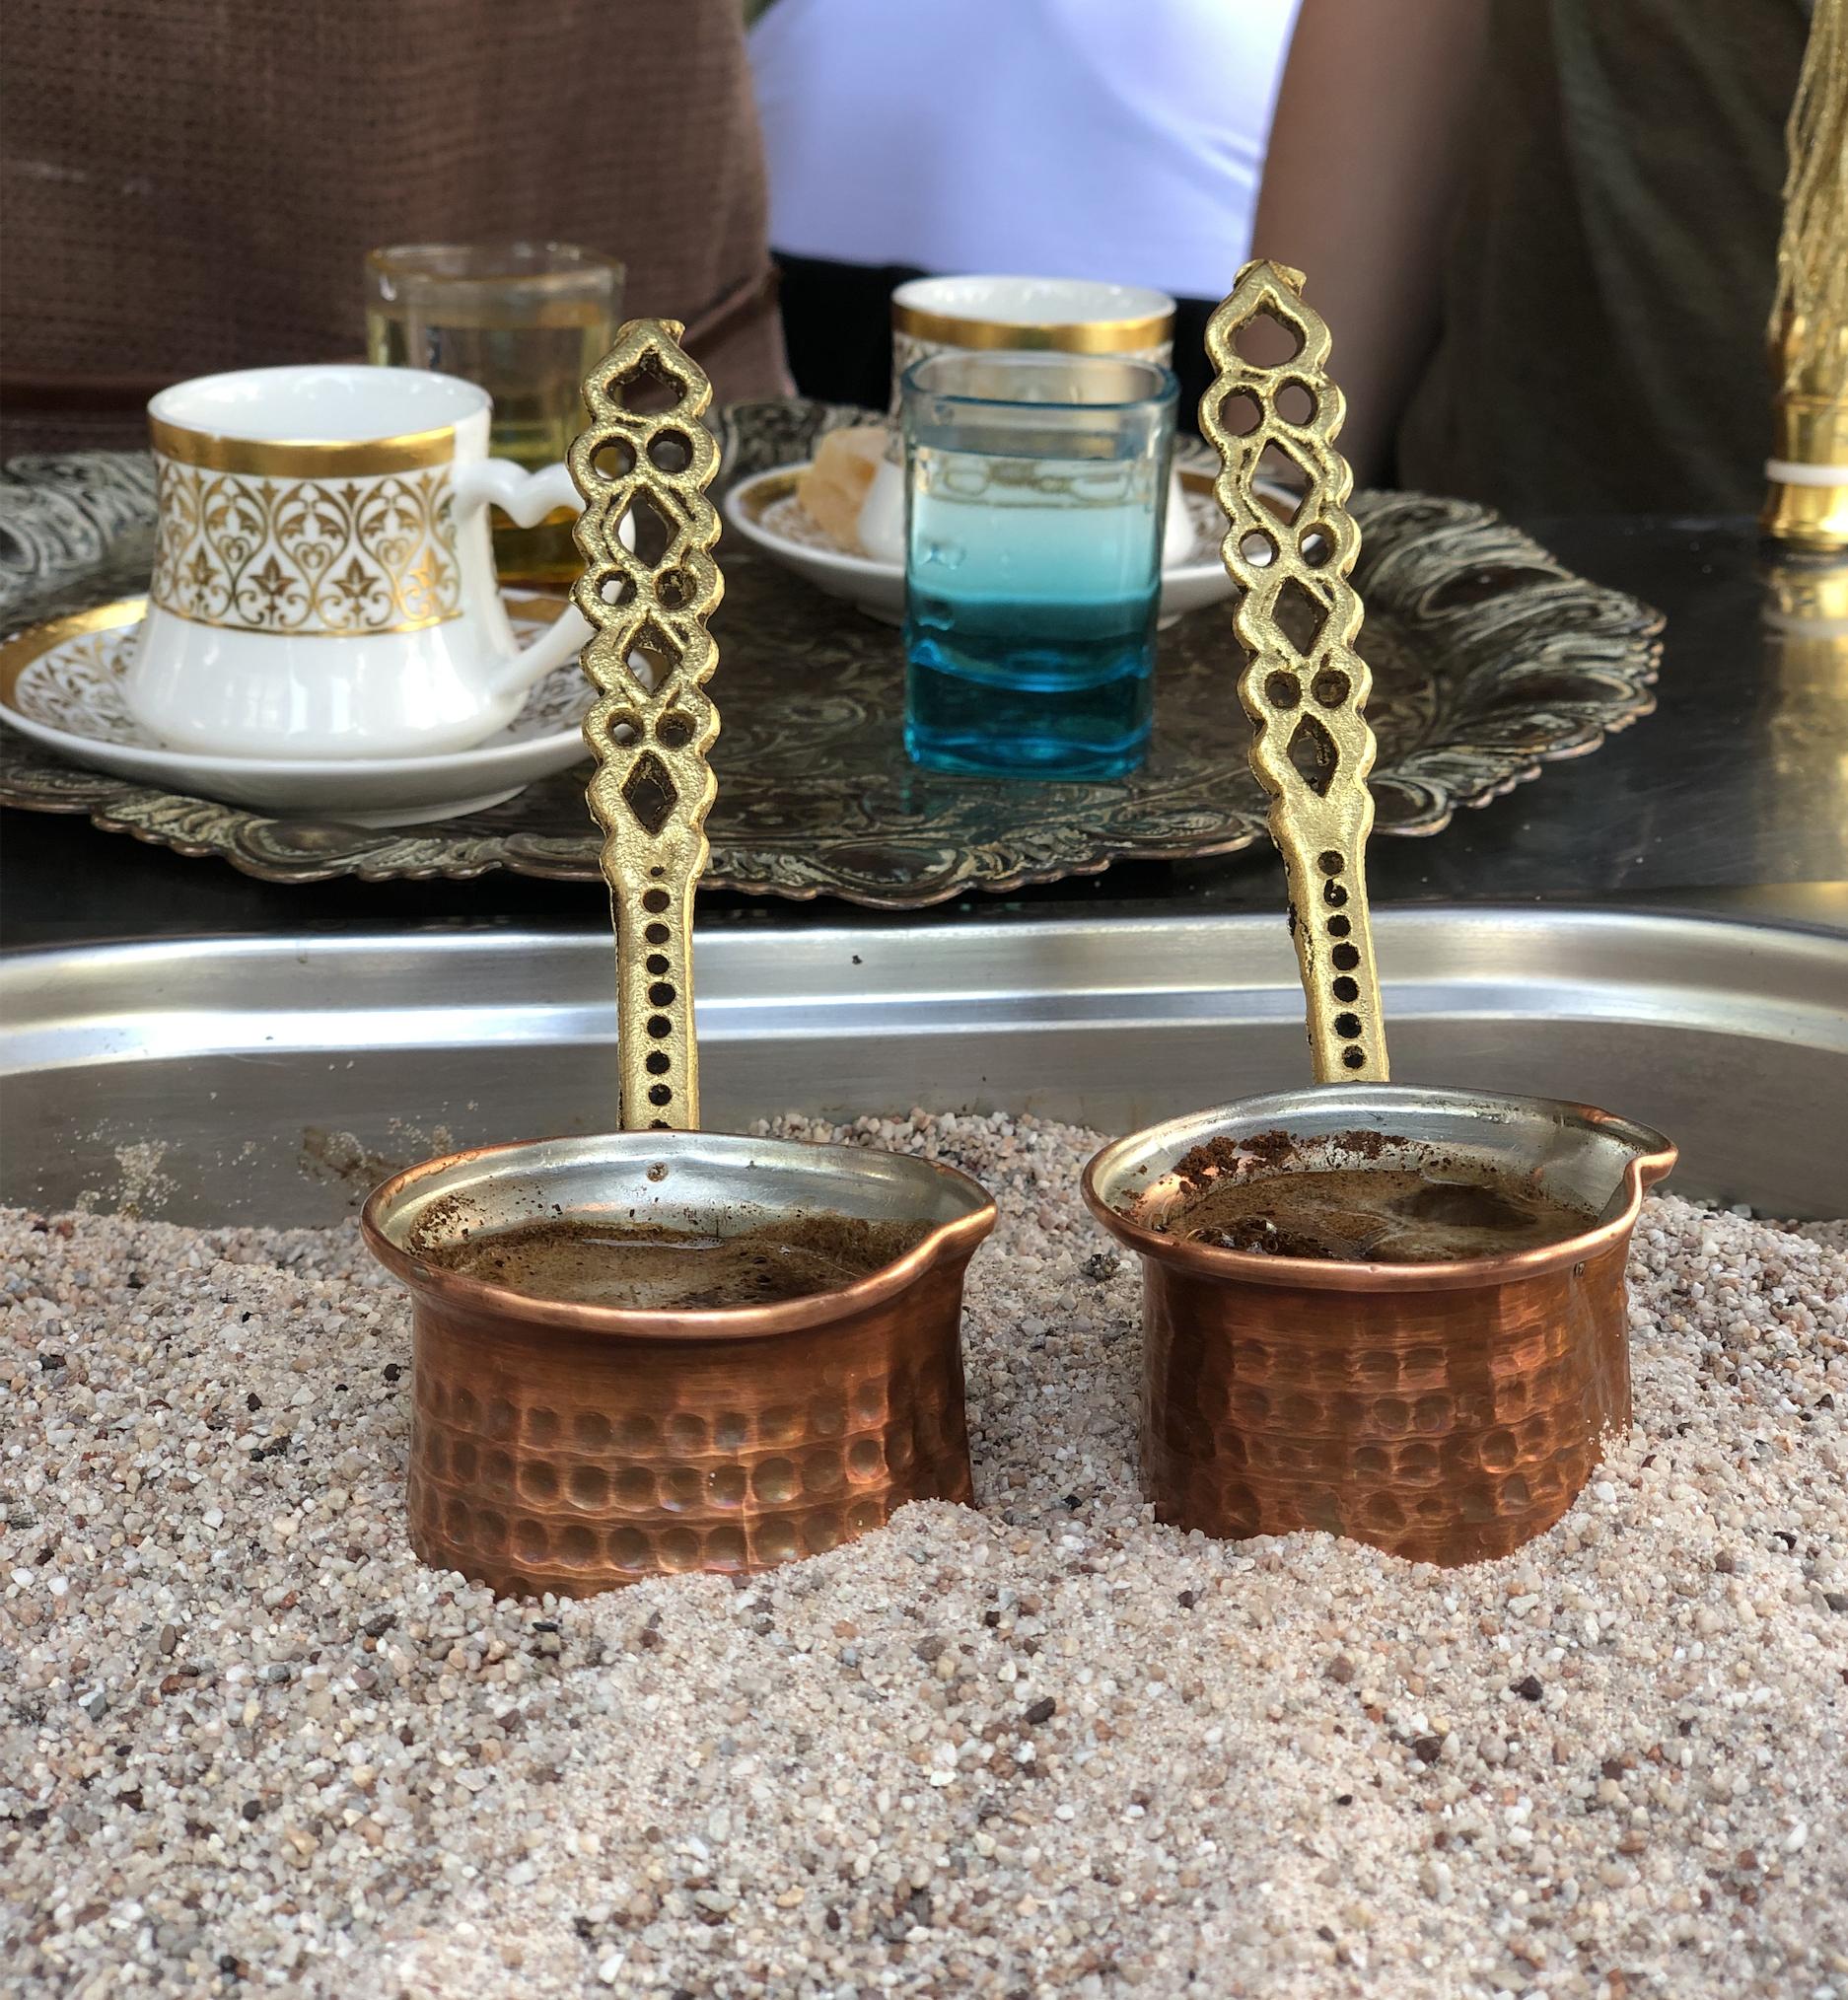 viaggiare insieme caffe turco